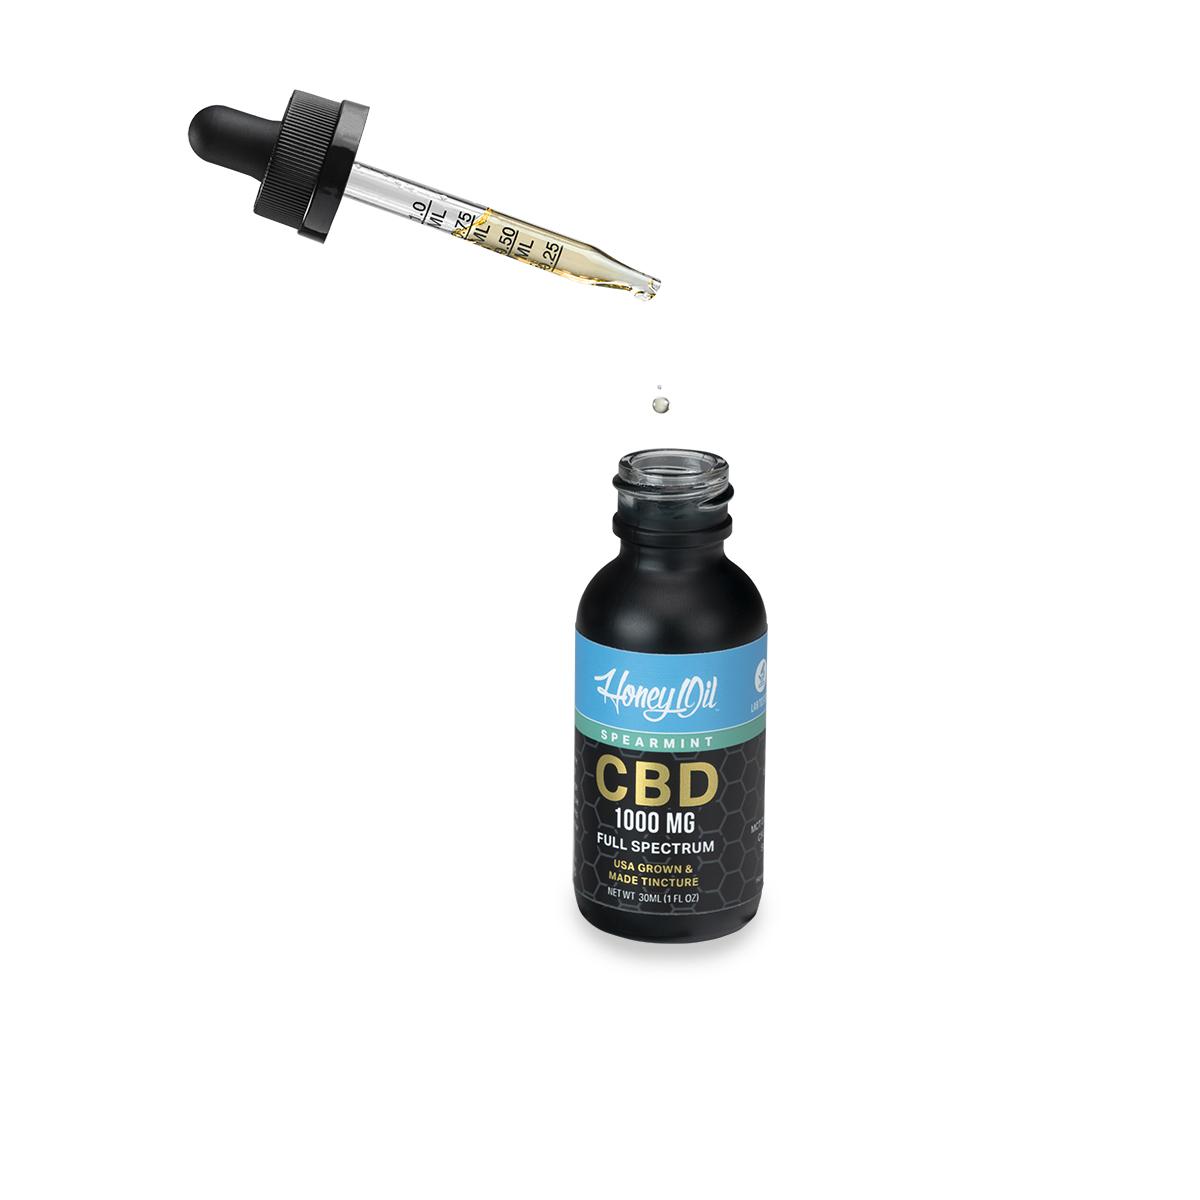 Spearmint FloatingDropper1000 - Spearmint Full Spectrum CBD Oil 1000 MG